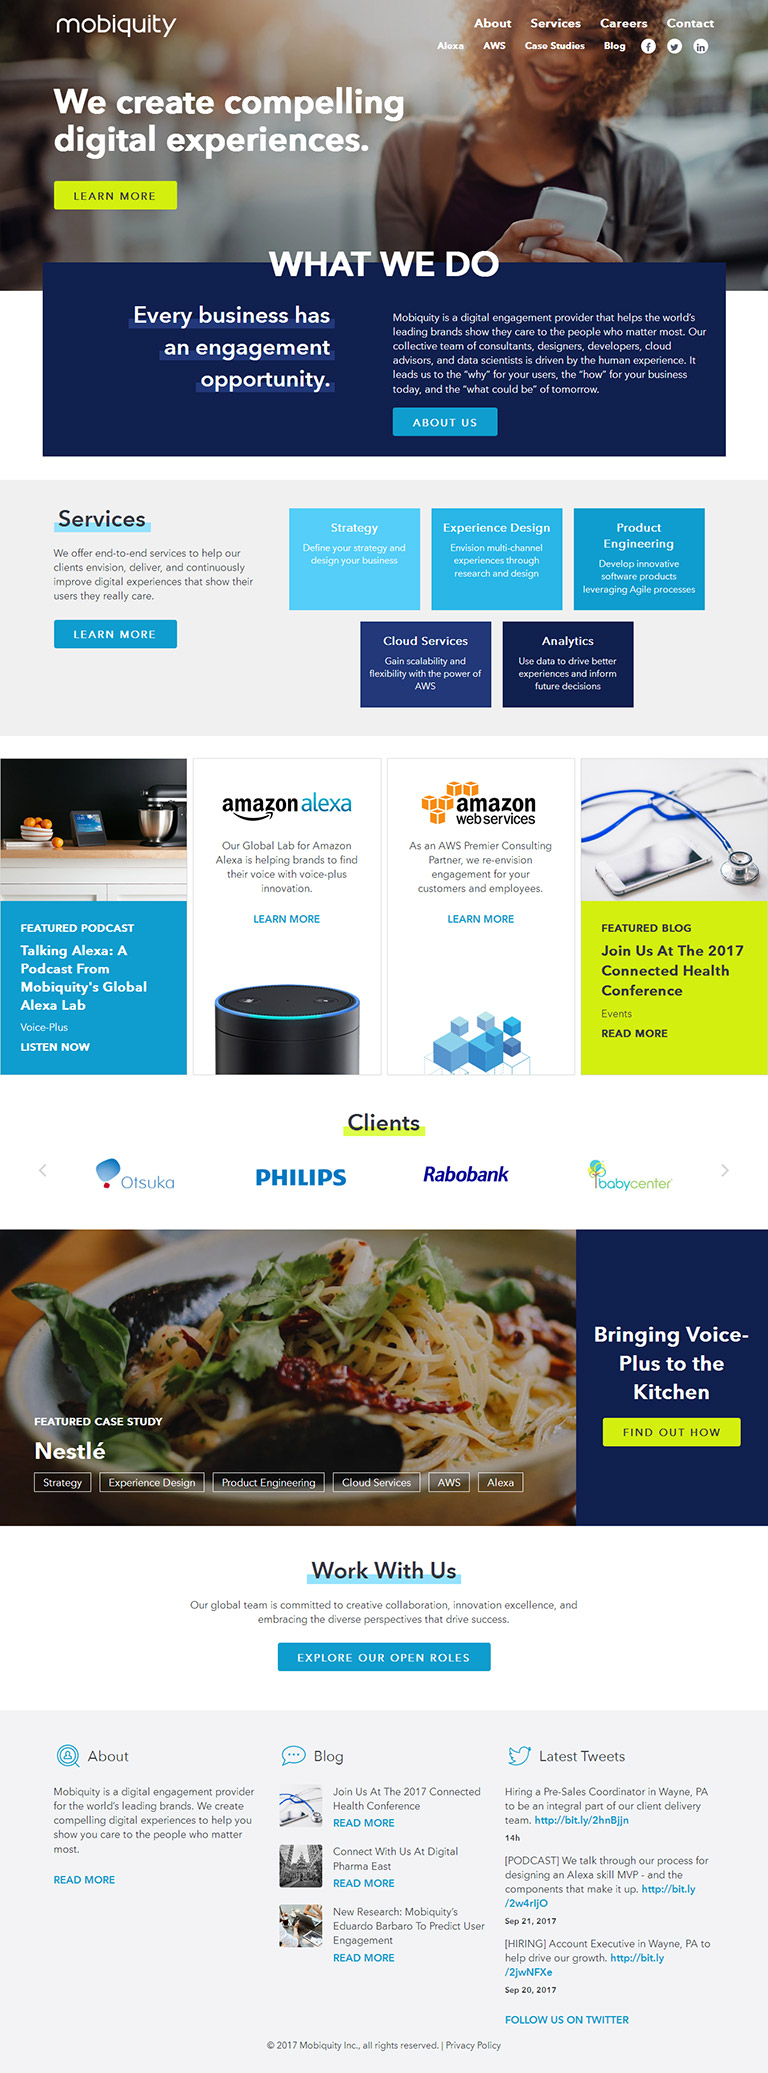 cms enterprise portal application case study